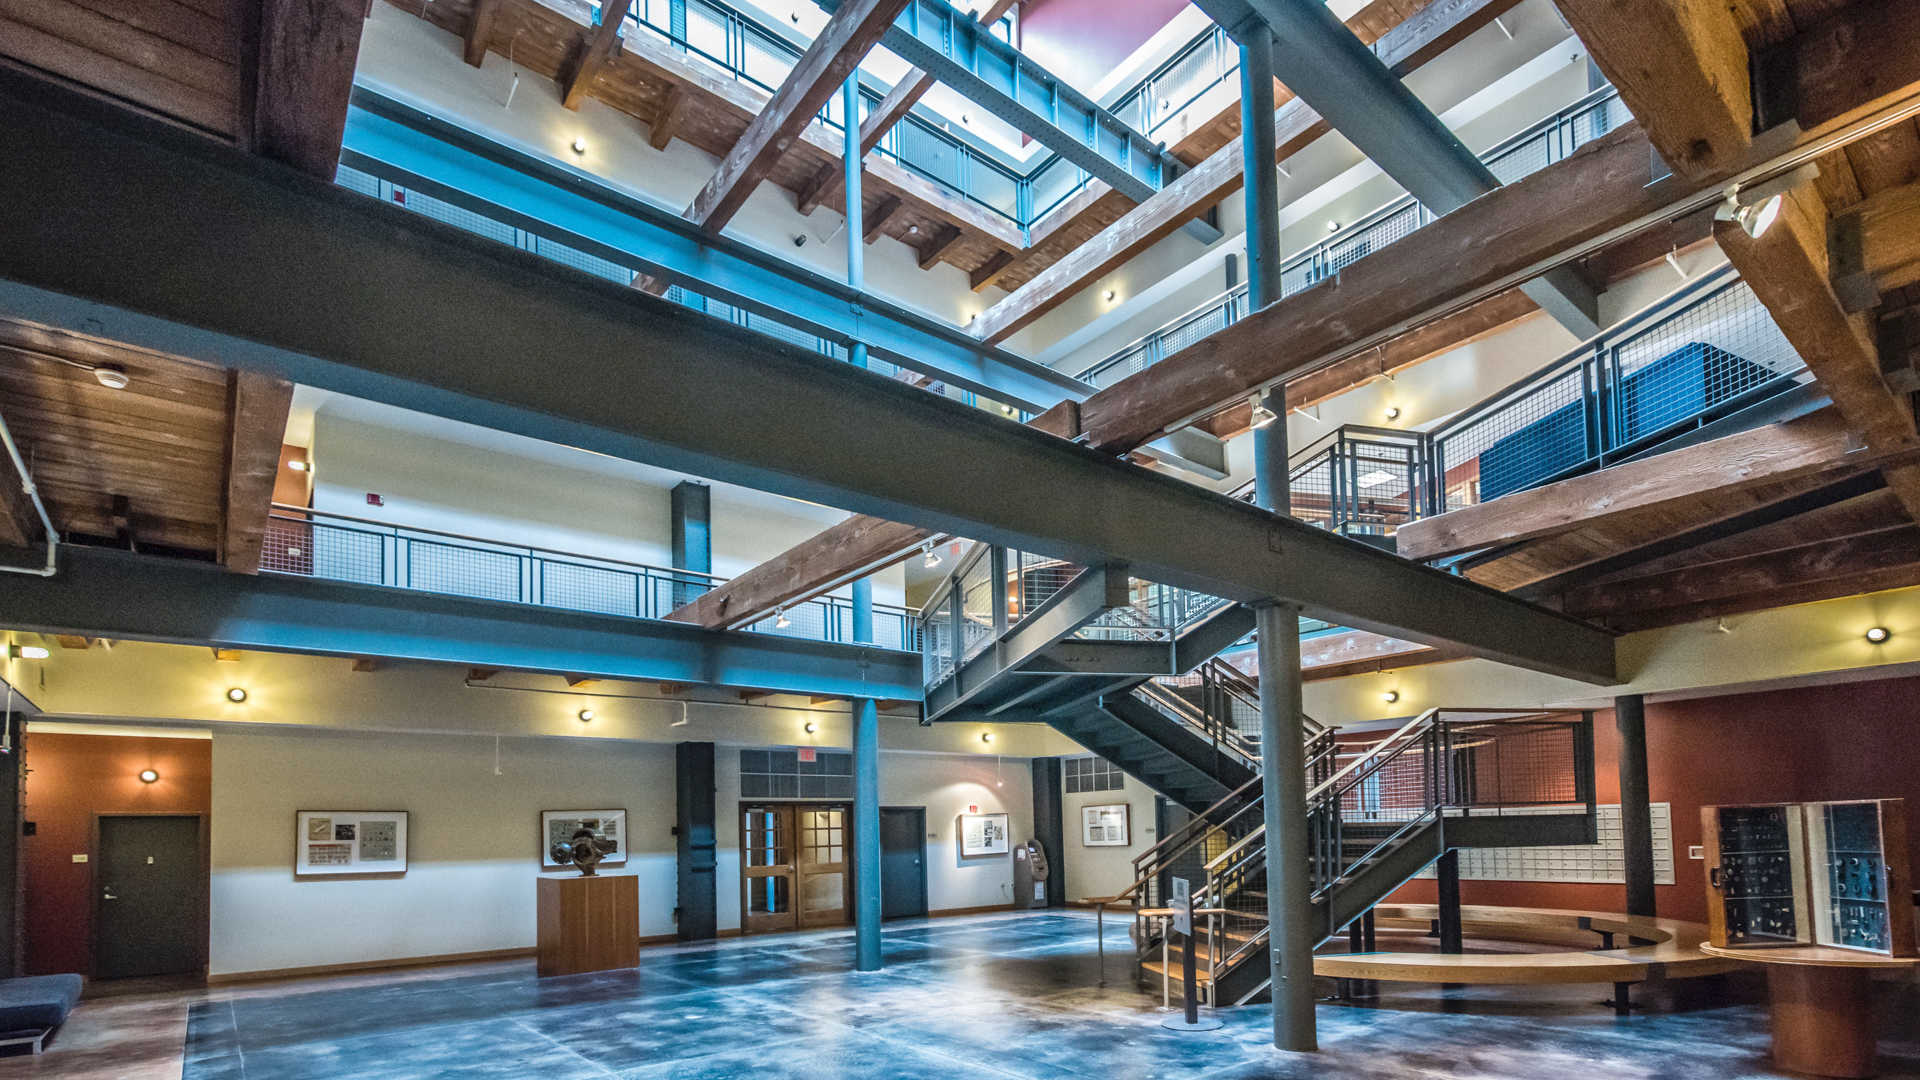 Lofts at kendall square apartments lobby atrium